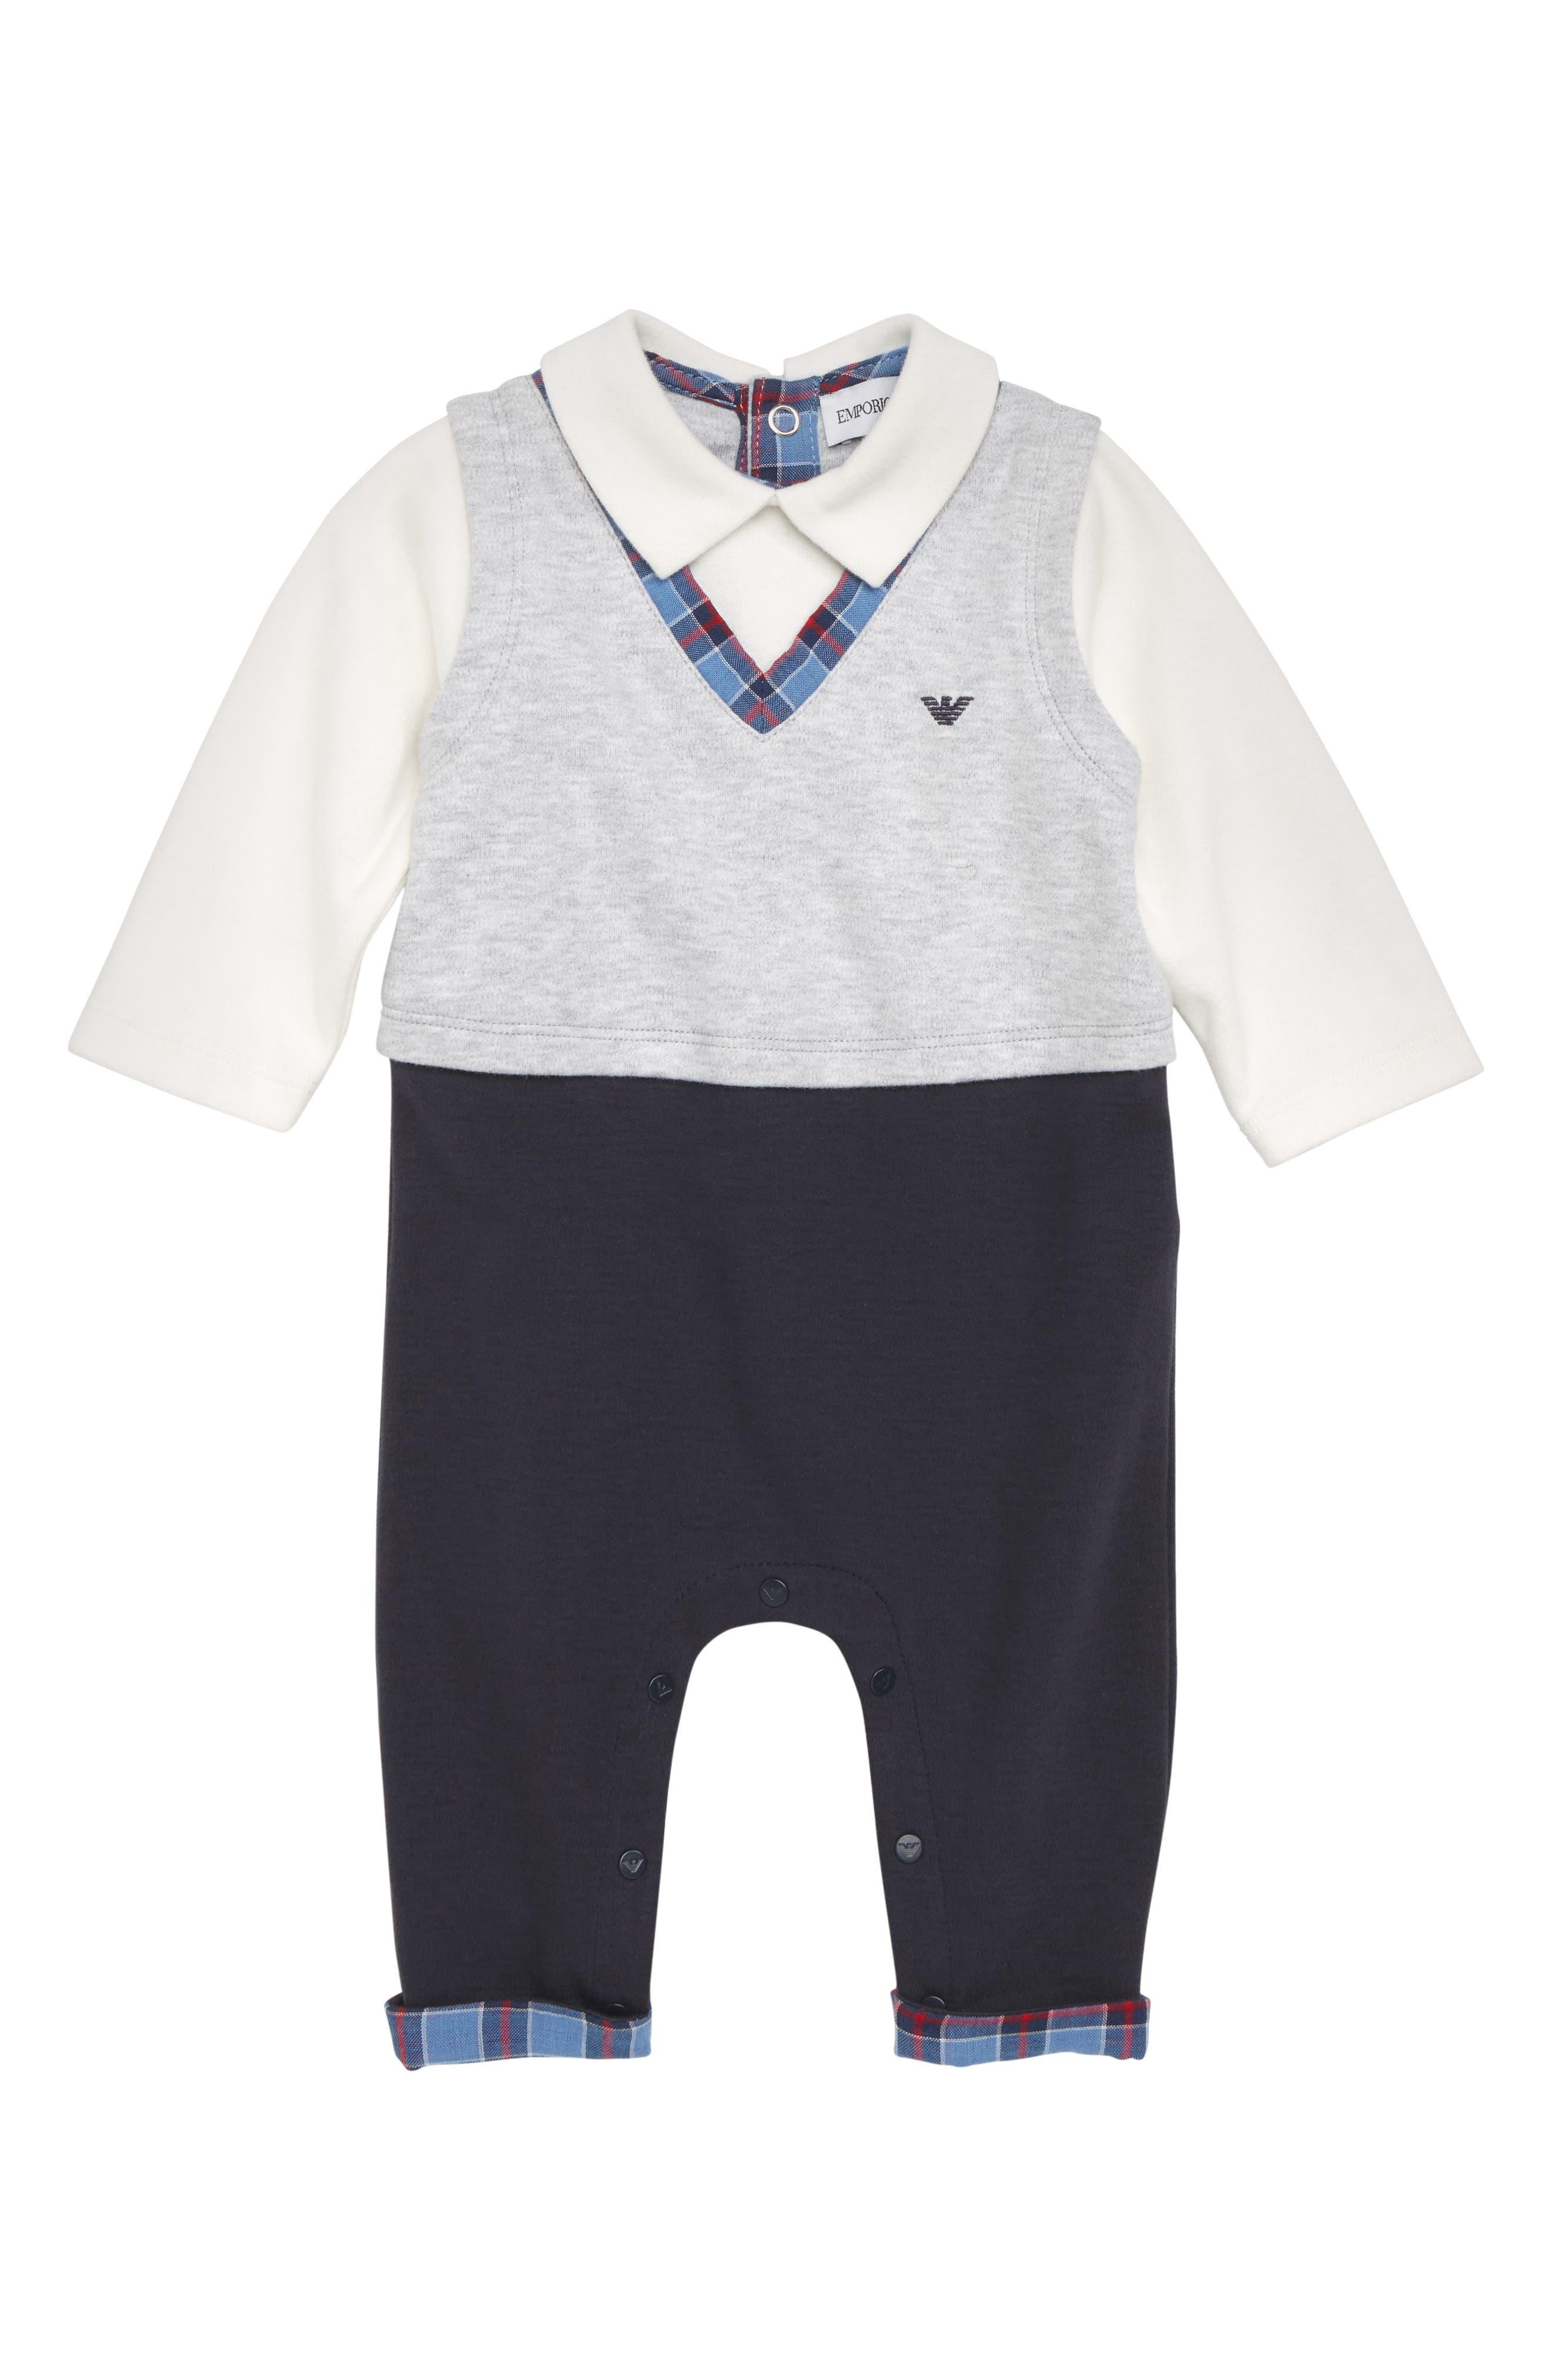 Polo Vest Romper,                         Main,                         color, SOLID BLUE NAVY